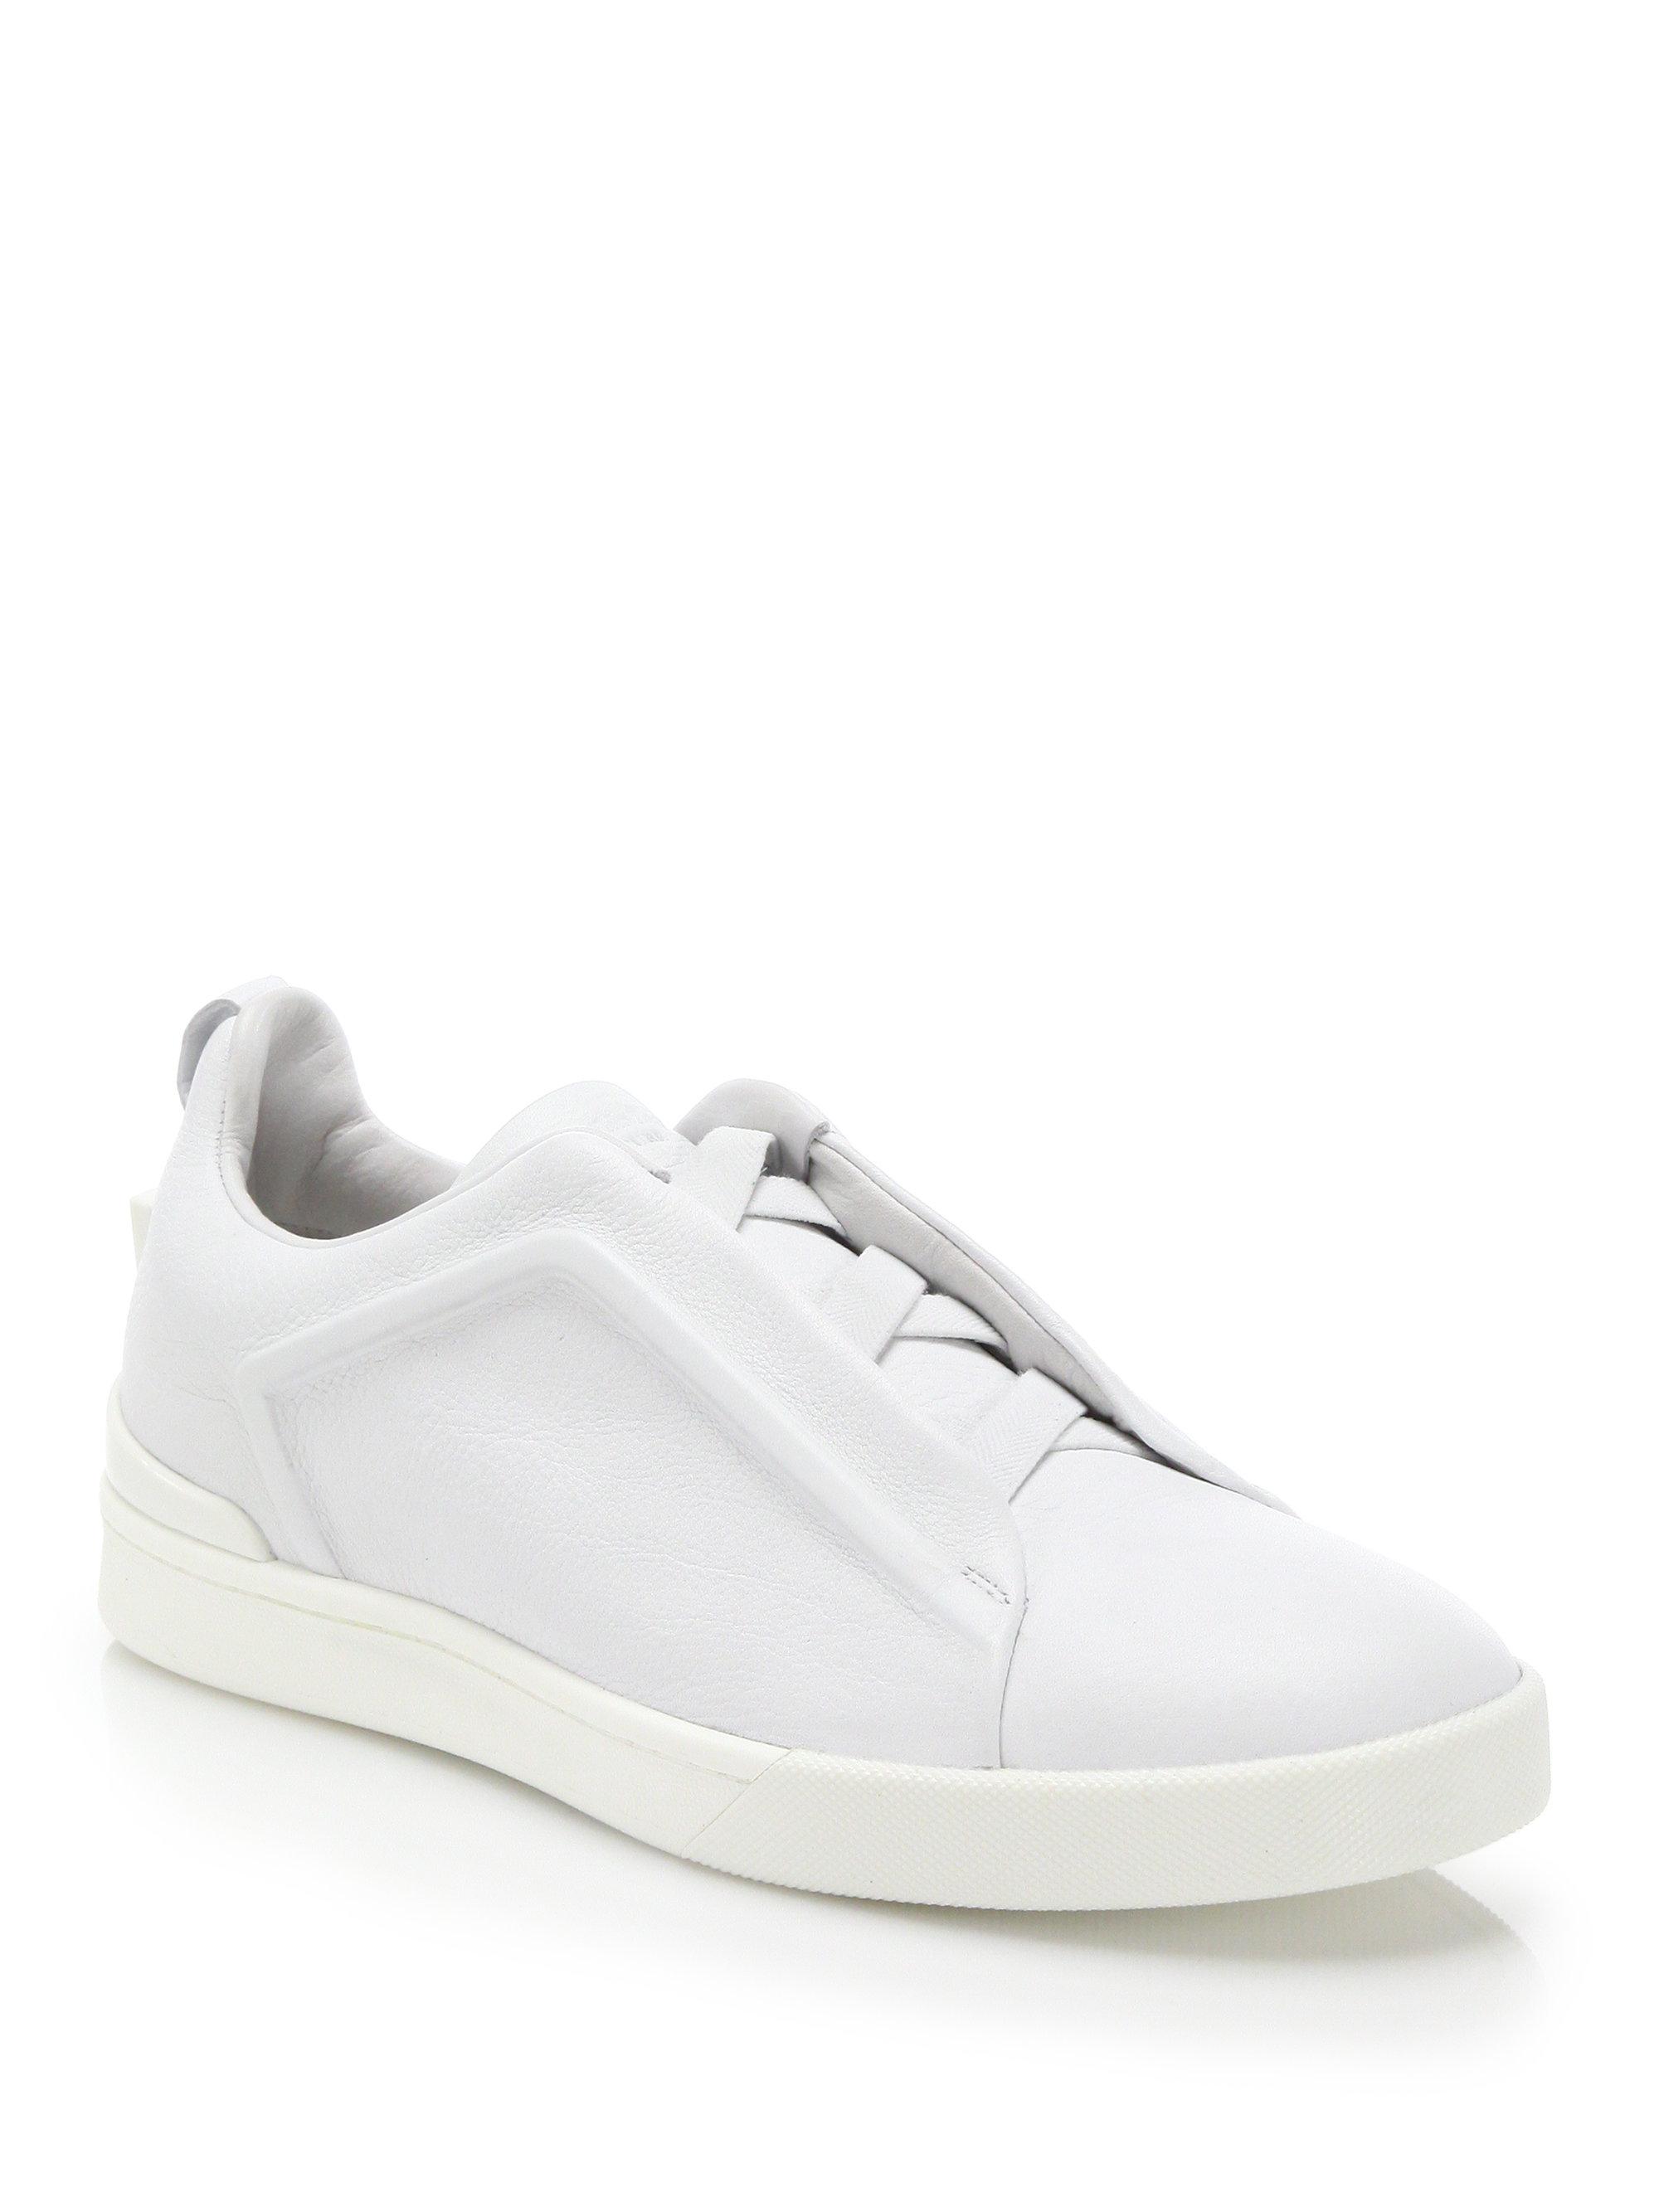 triple stitch sneakers Ermenegildo Zegna sVgxs7Eb